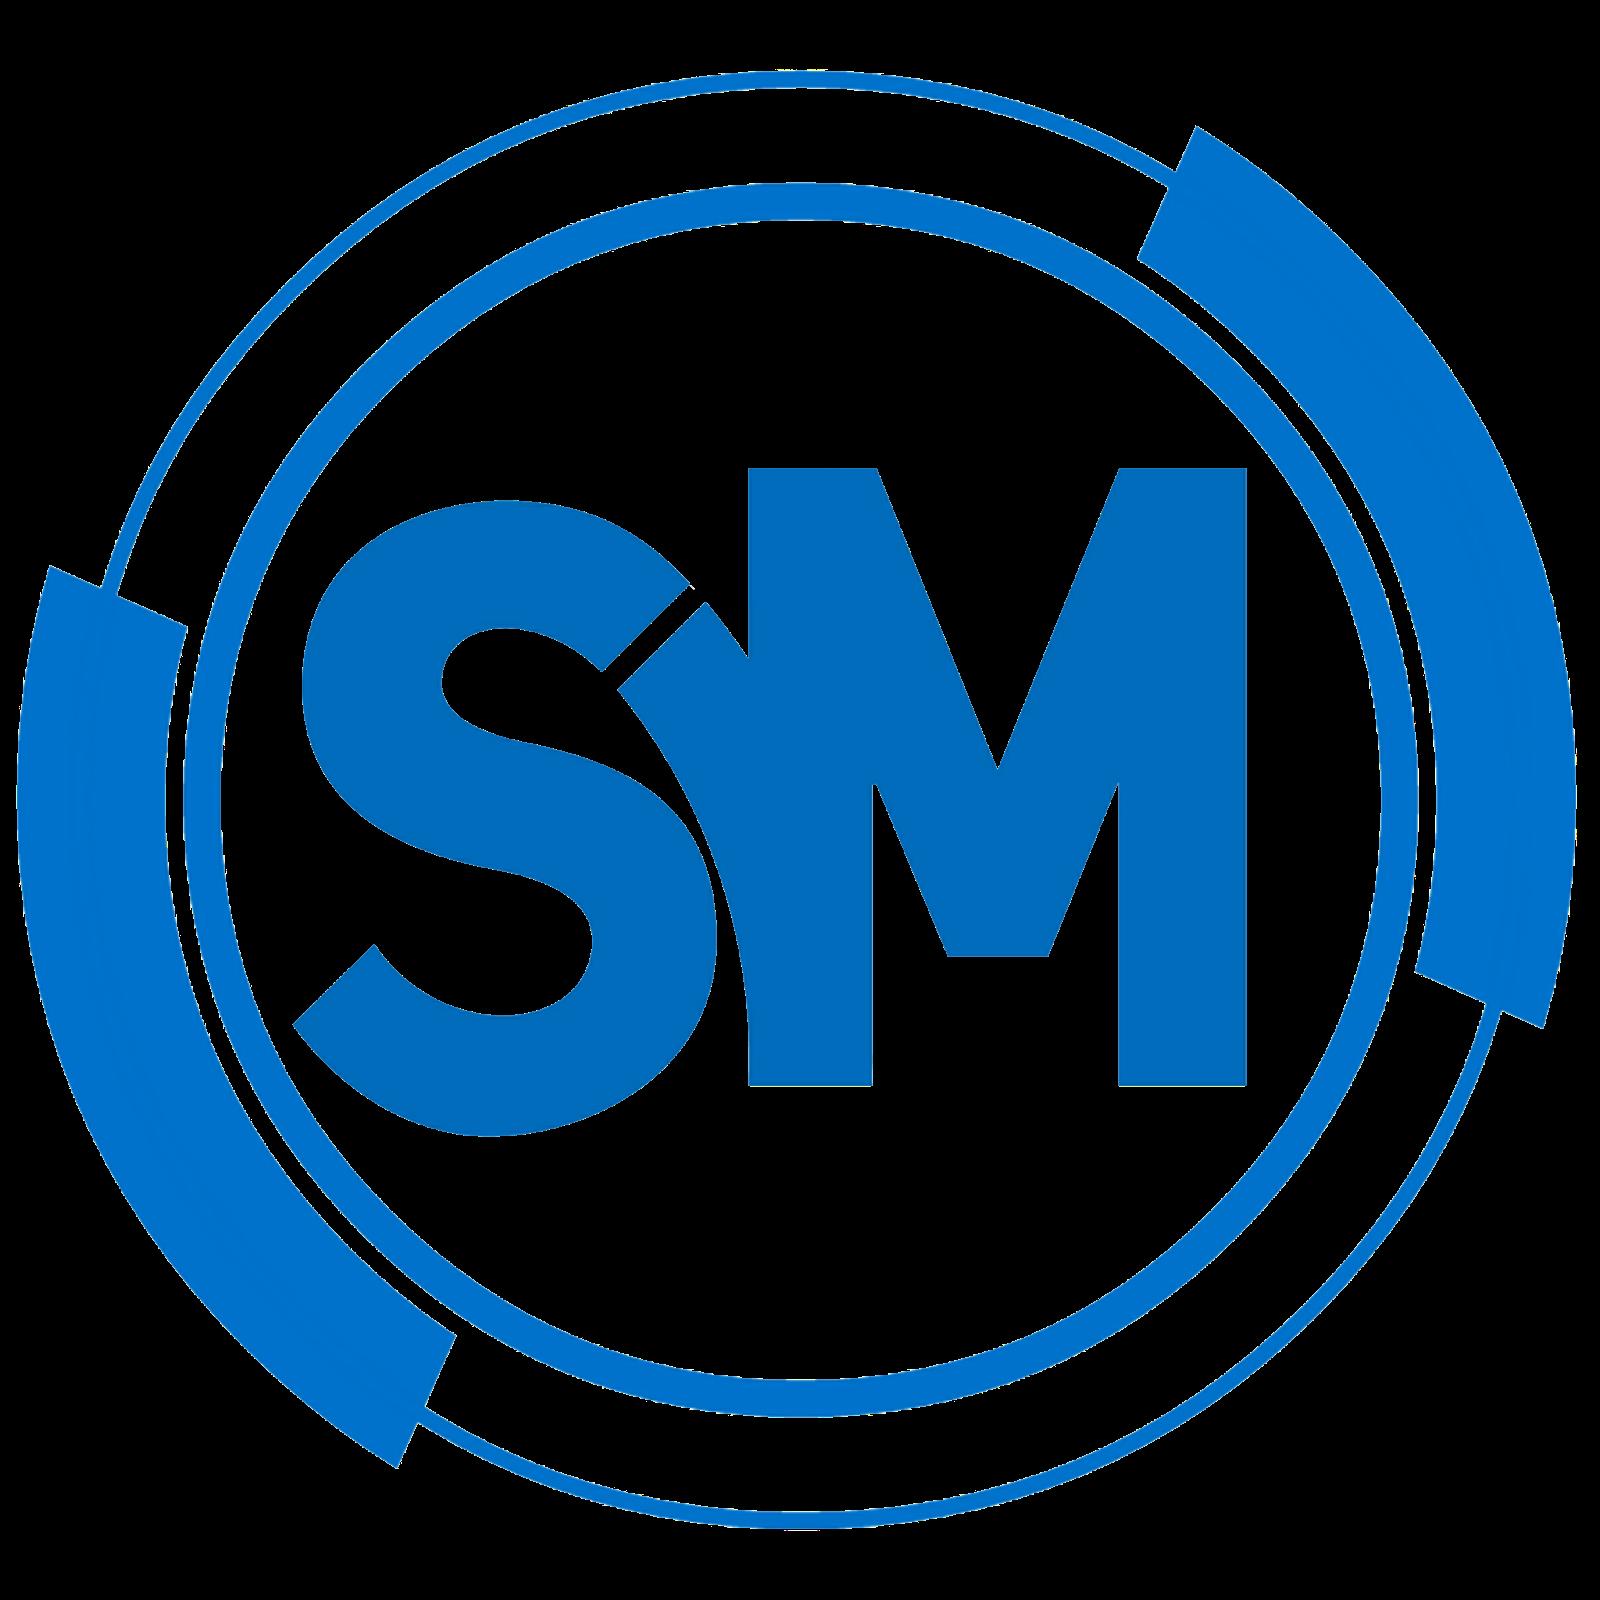 SIMPATIKMEDIA.COM